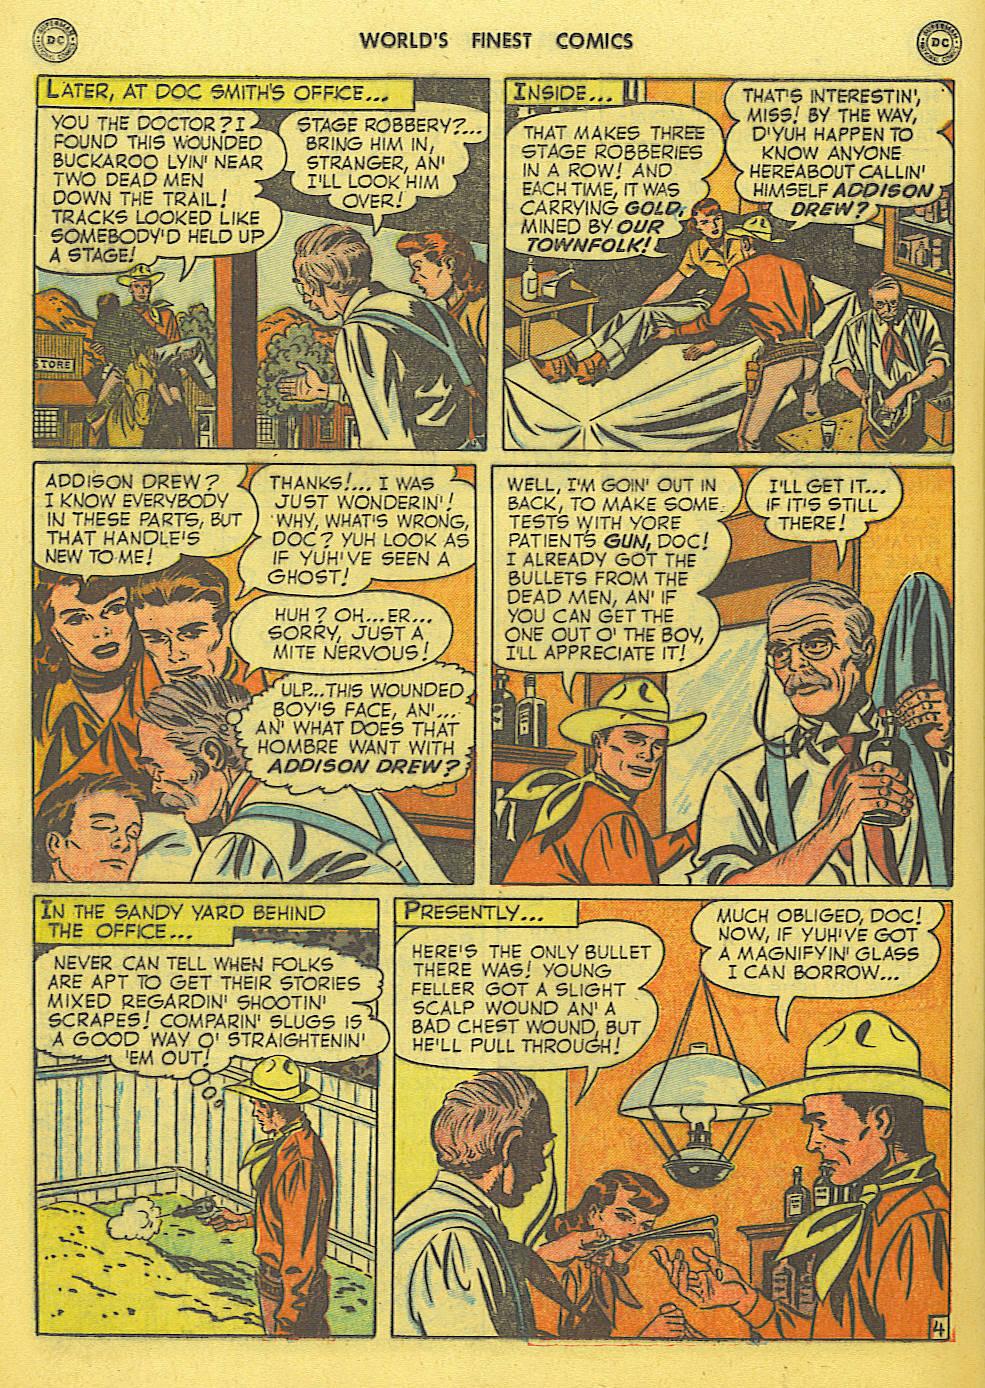 Read online World's Finest Comics comic -  Issue #49 - 43